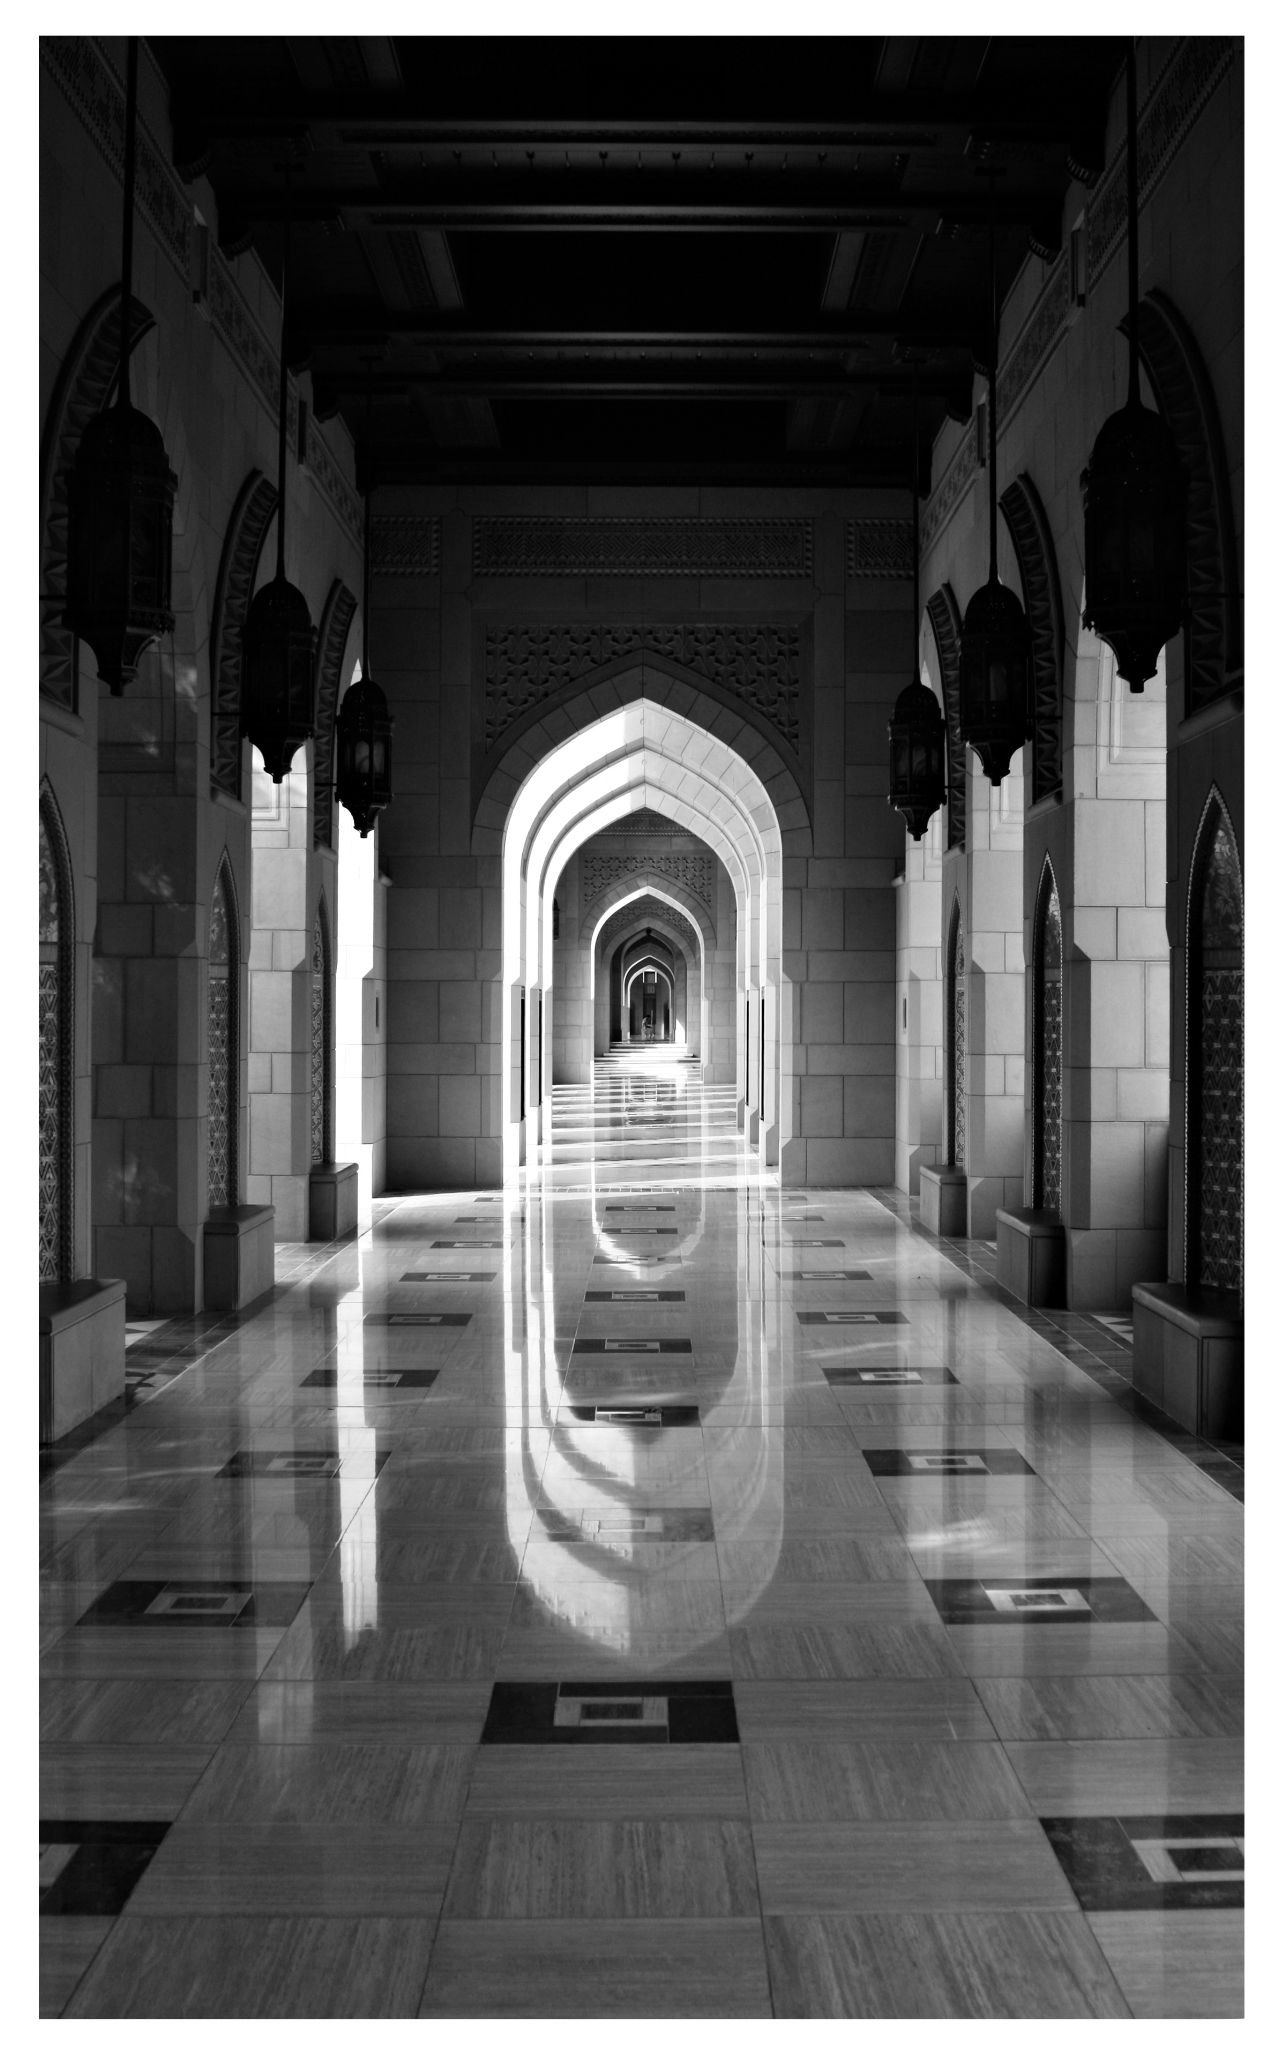 Grand Mosque Hallway by jao.abenoja